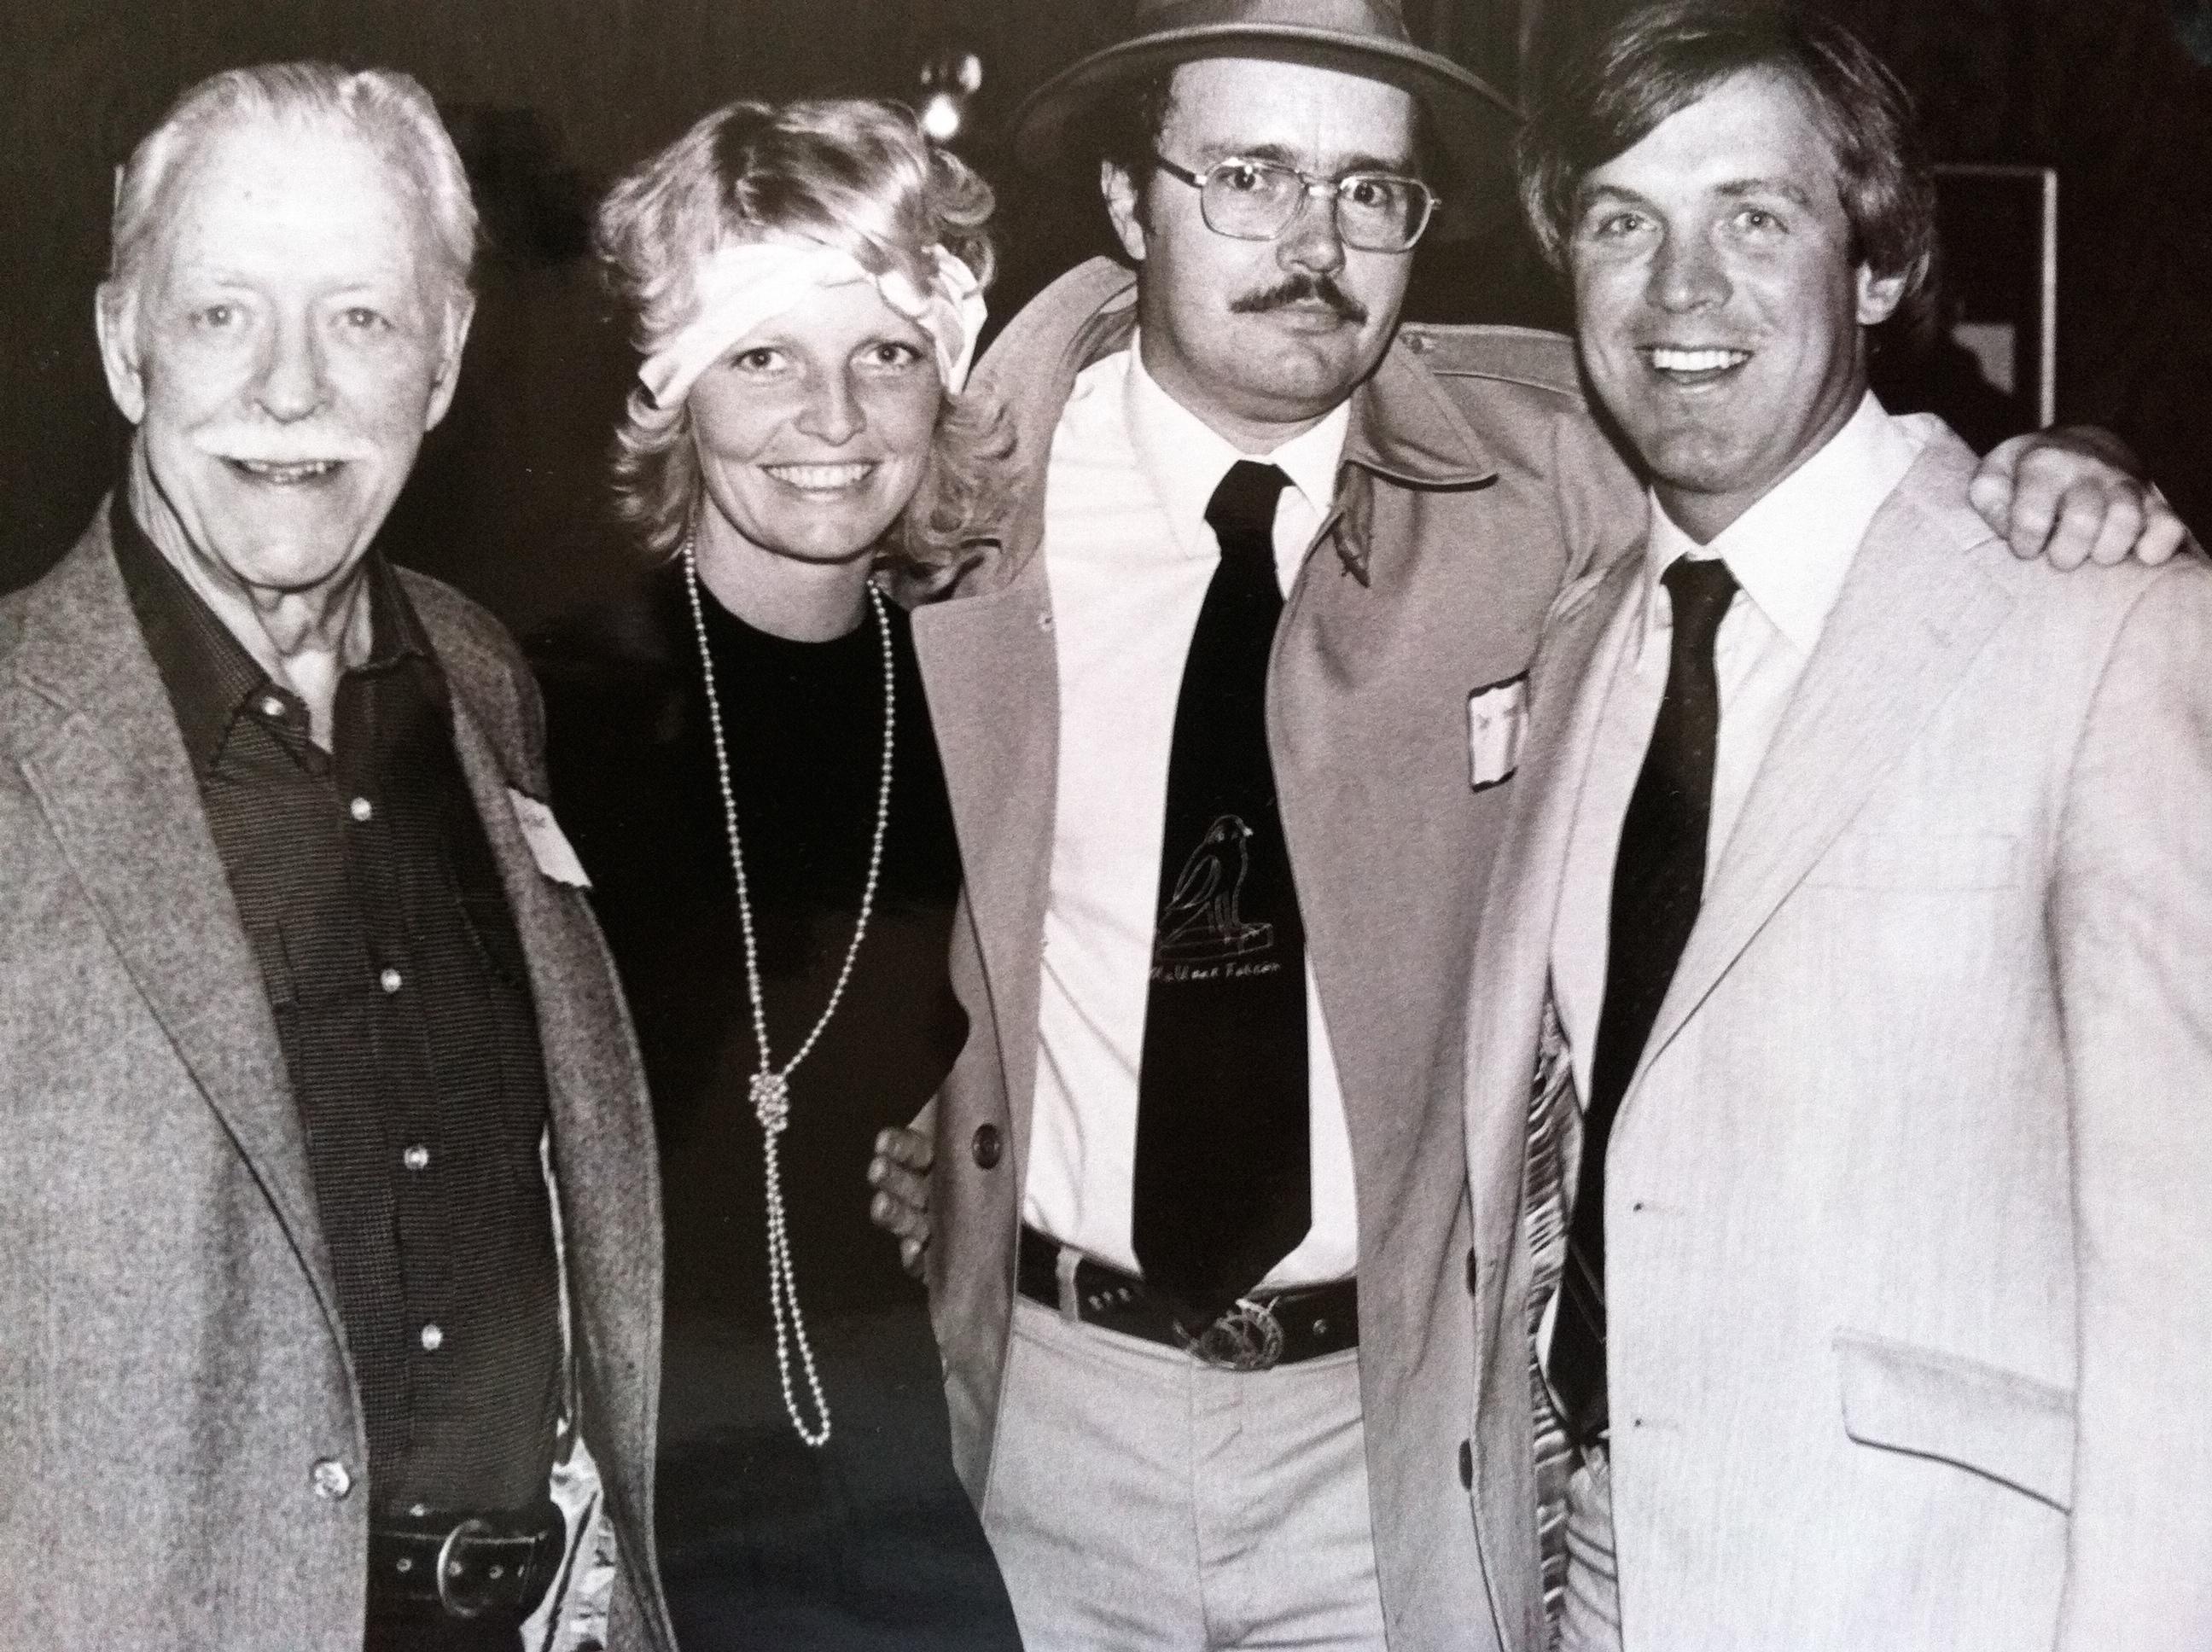 Lyle Talbot Nancy Hult Don Herron Stephen Talbot